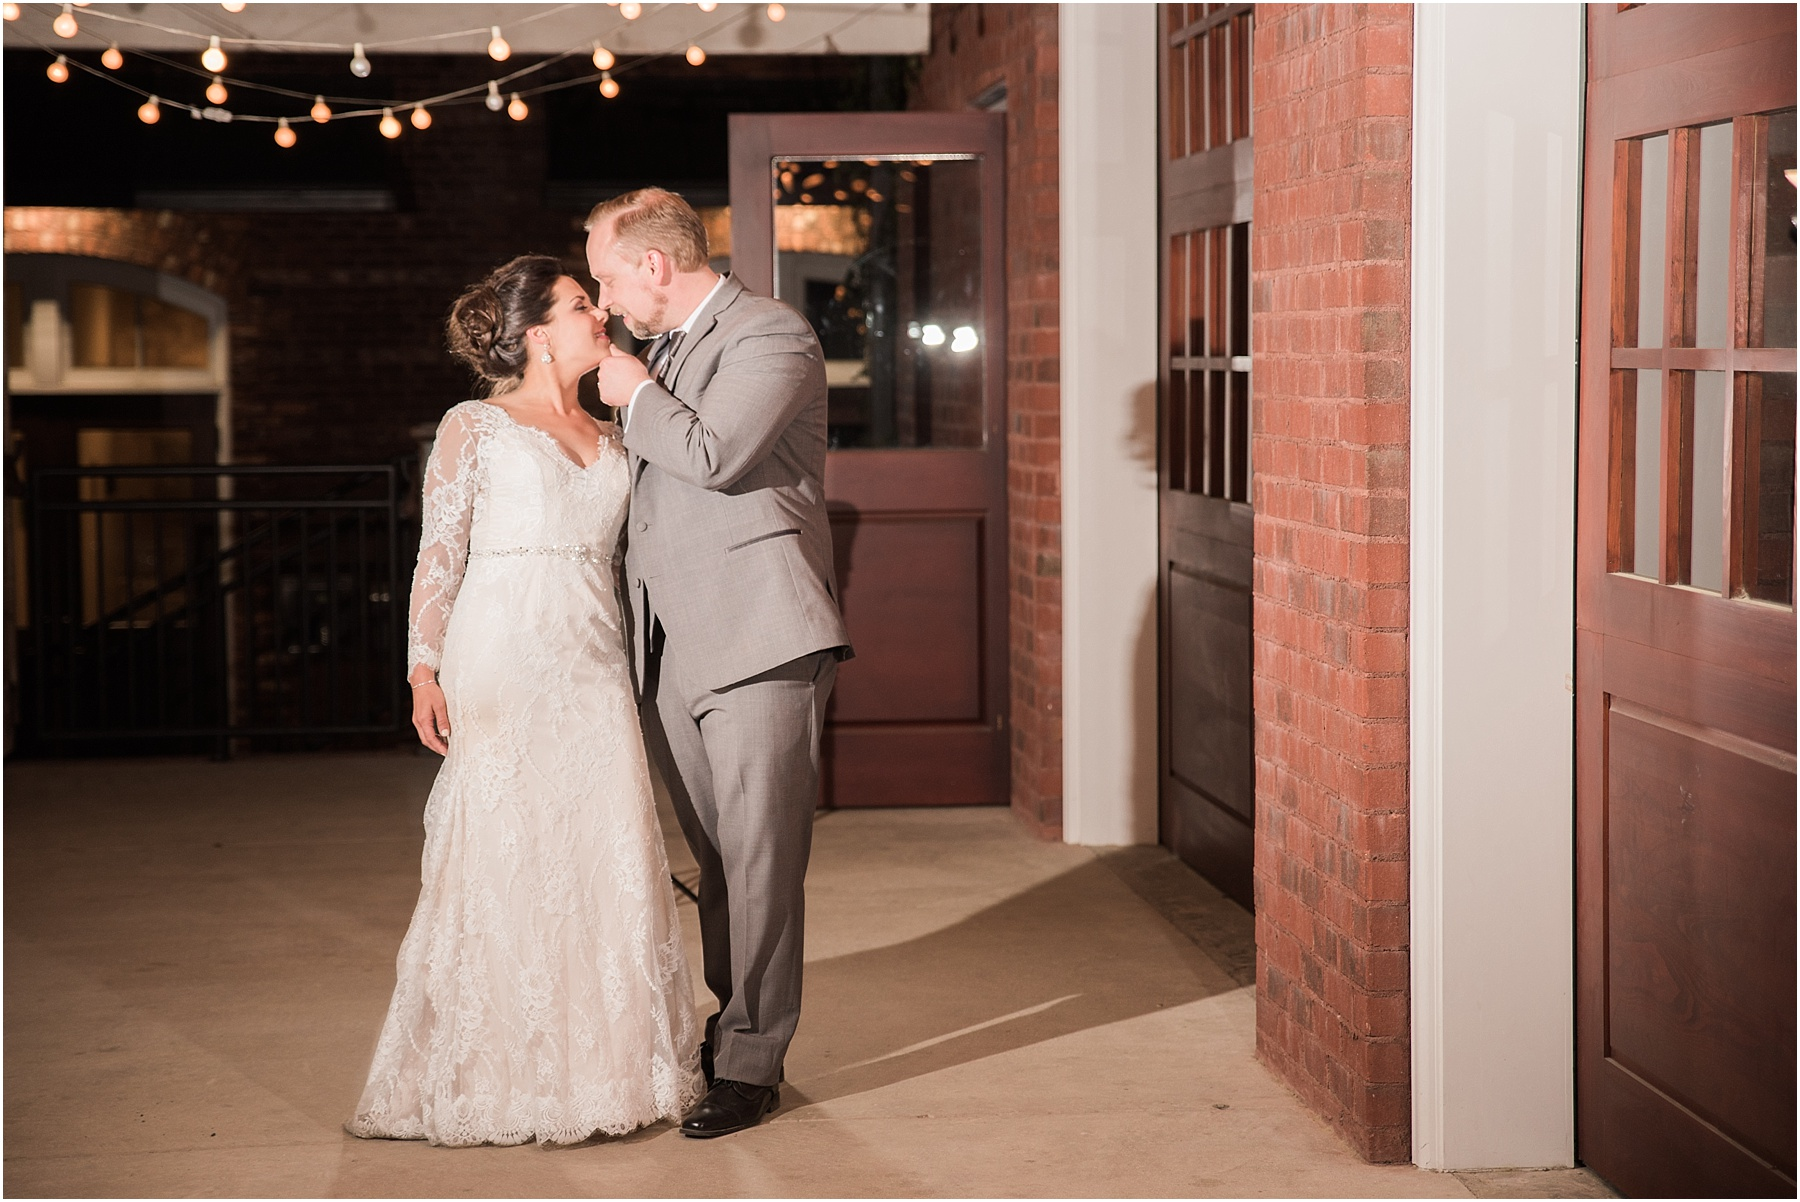 701 Whaley Wedding Photography Columbia SC wedding photographer melissa brewer photography OCF off camera flash bride and groom portrait